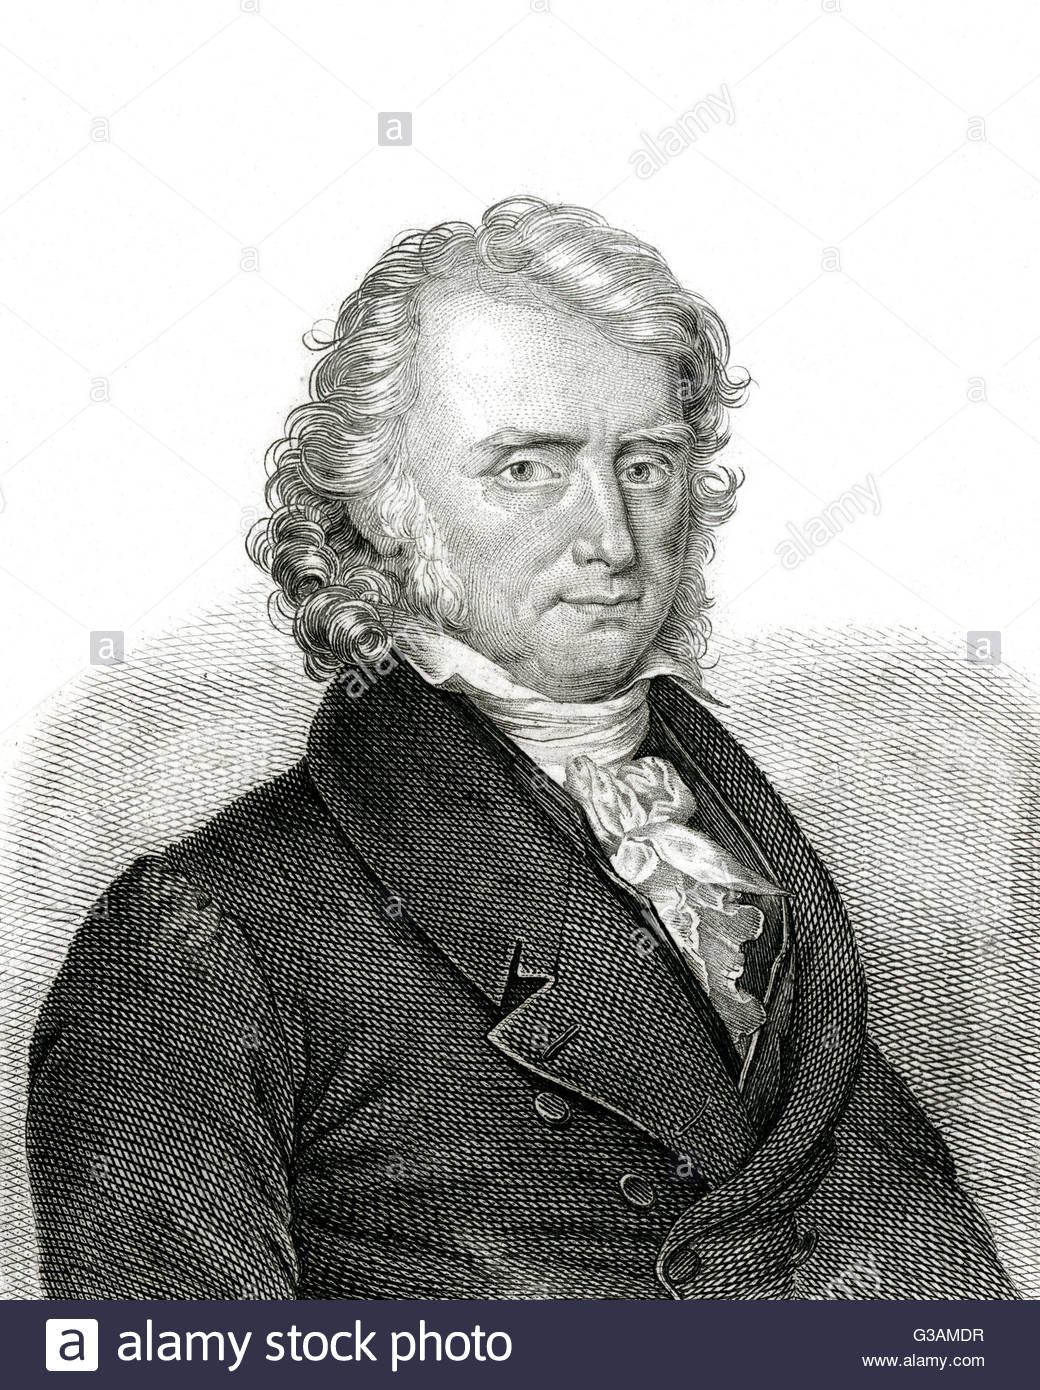 henri-benjamin-constant-de-rebecque-1767-1830-a-swiss-born-french-G3AMDR